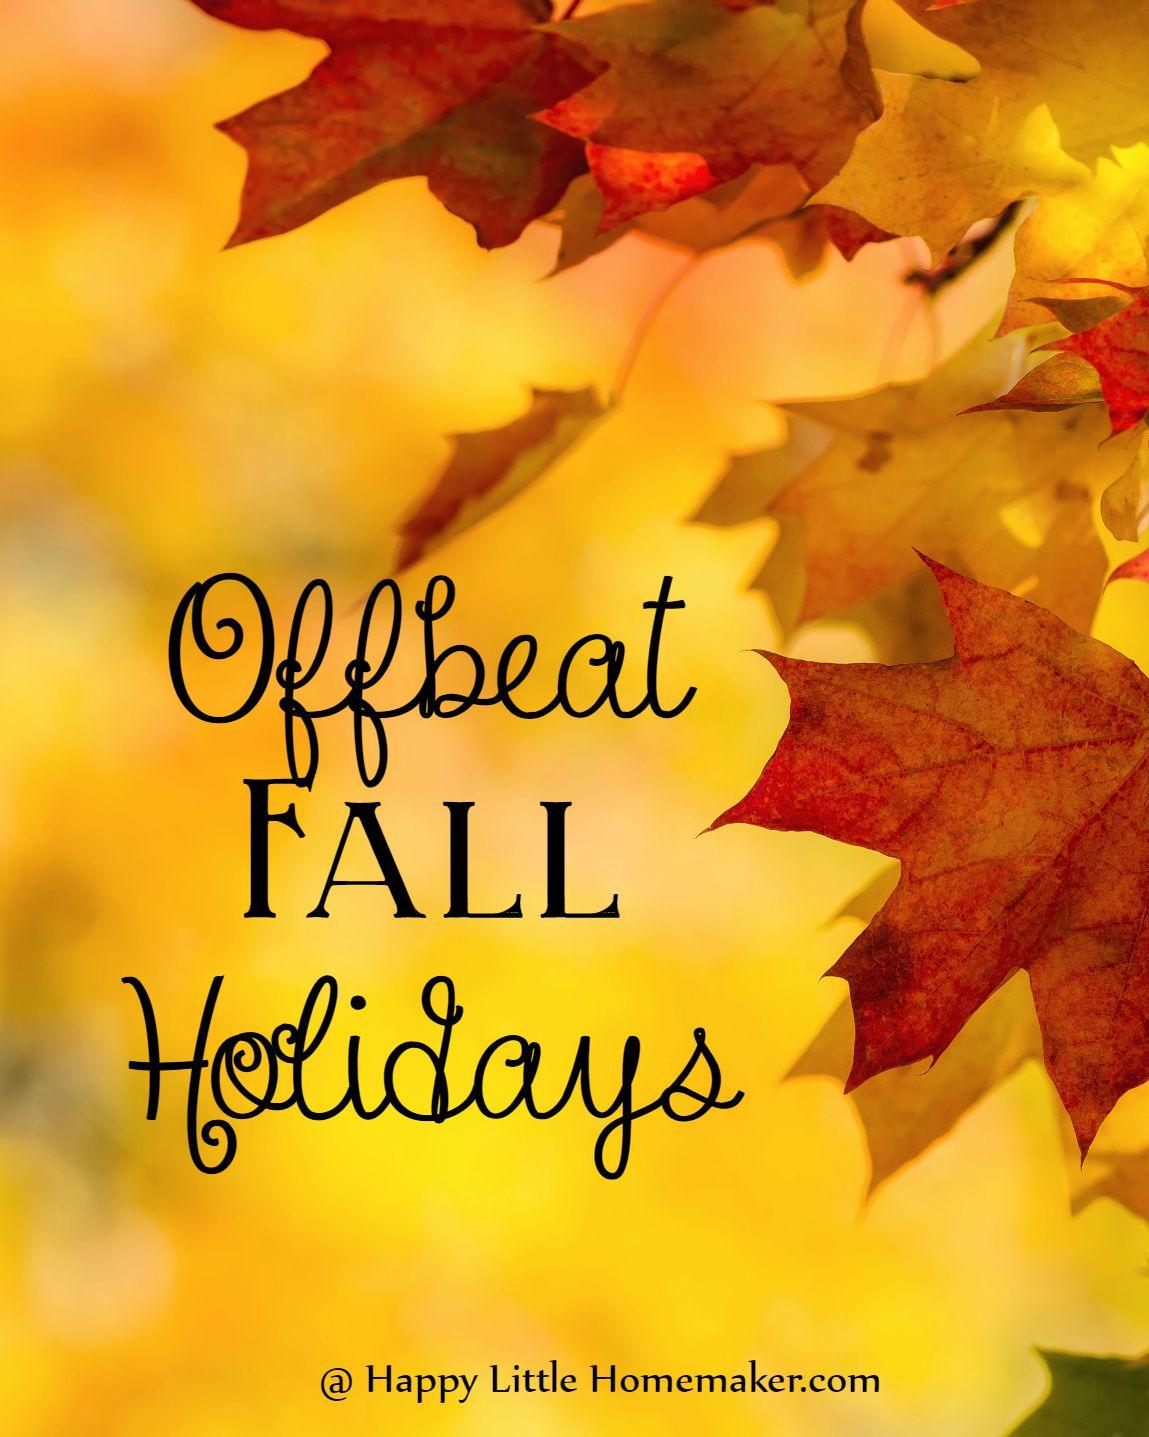 offbeat fall holidays